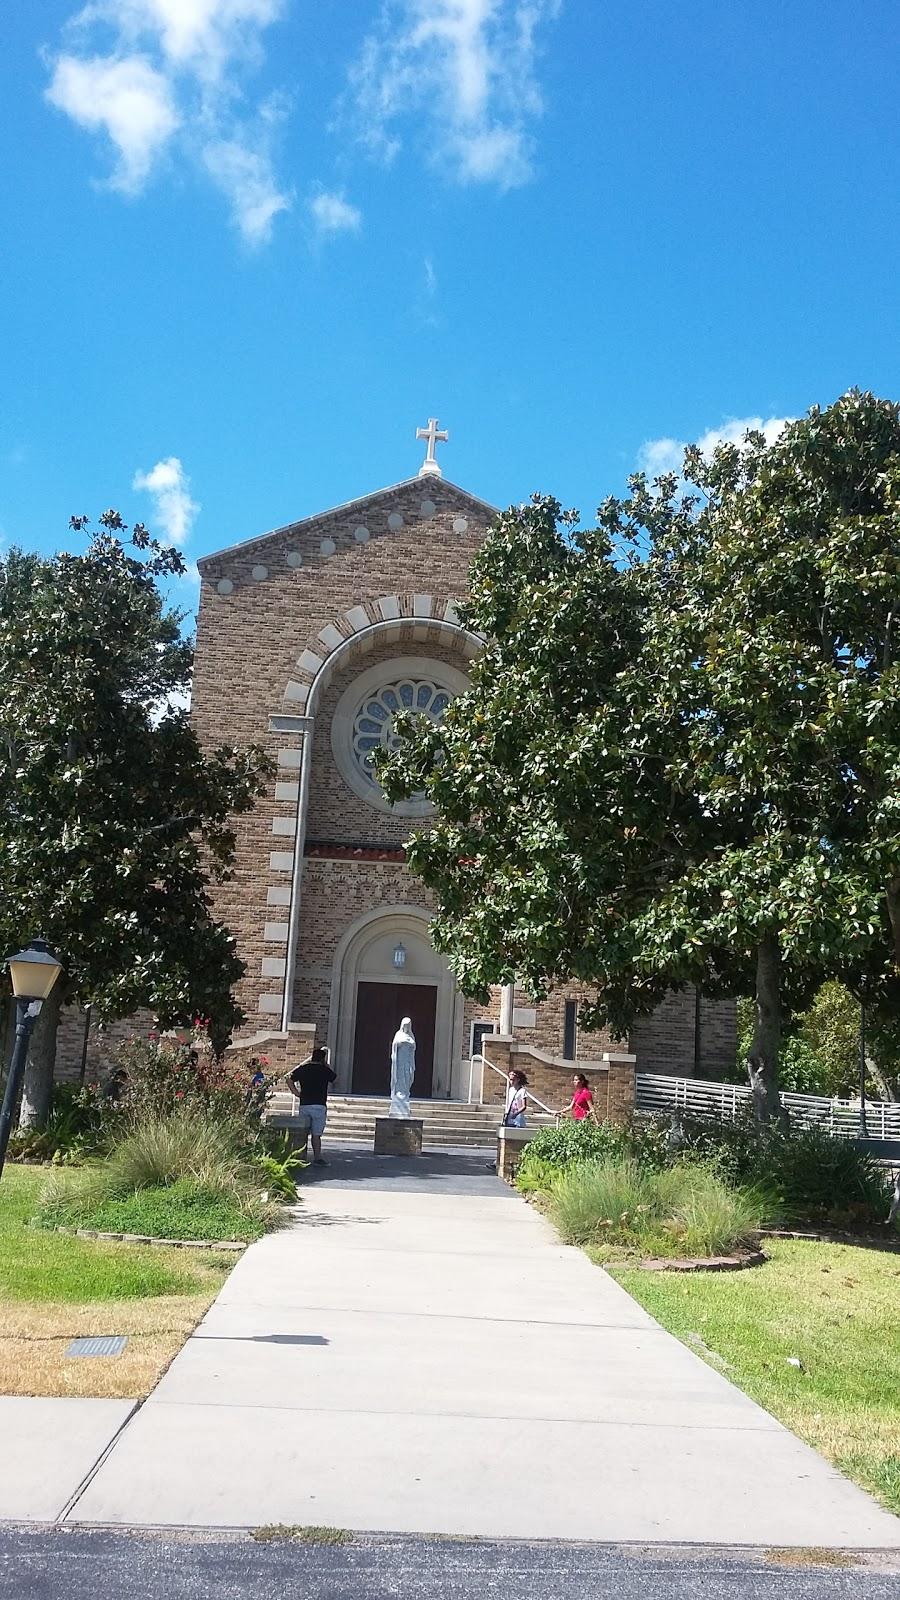 St Marys Church - church    Photo 6 of 10   Address: 816 Park Dr, La Porte, TX 77571, USA   Phone: (281) 471-2000